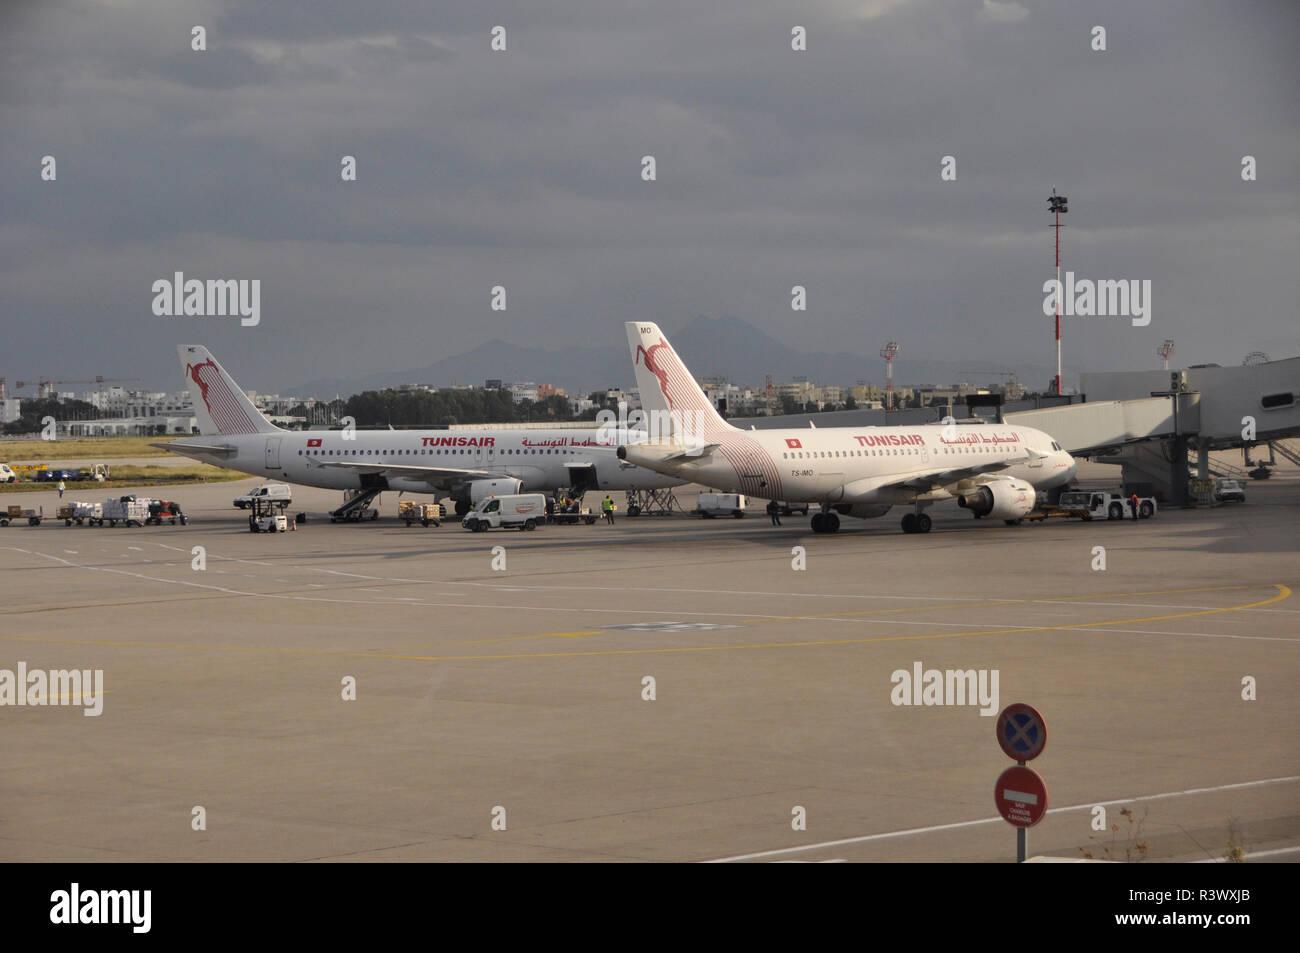 Tunesia: Tunis Air aircrafts at Tunis airport - Stock Image